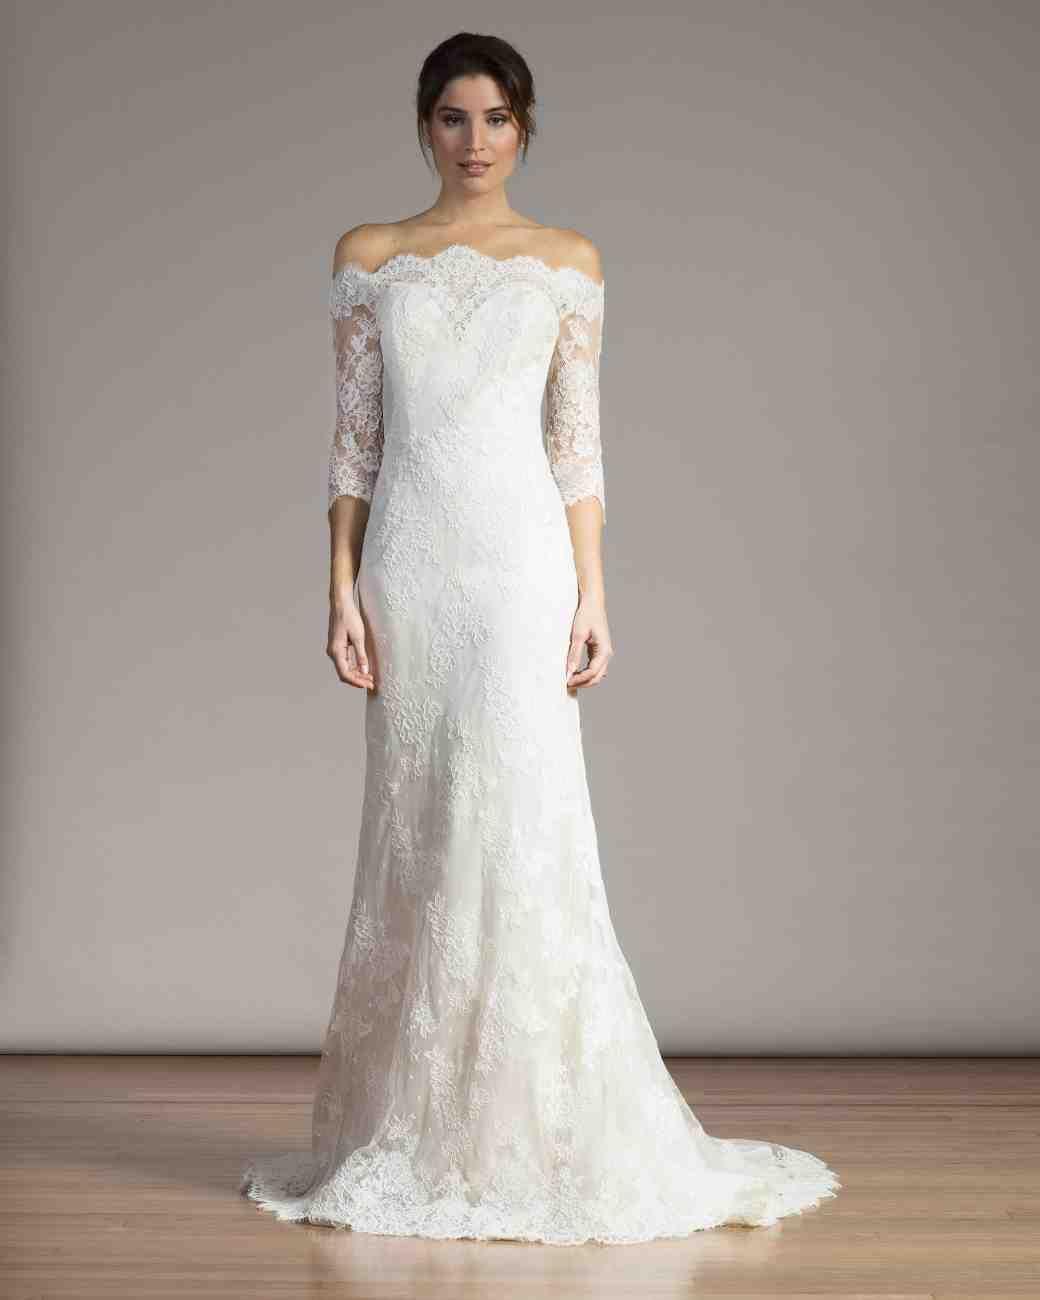 Spring Wedding Dresses: Long-Sleeve Wedding Dresses We Love